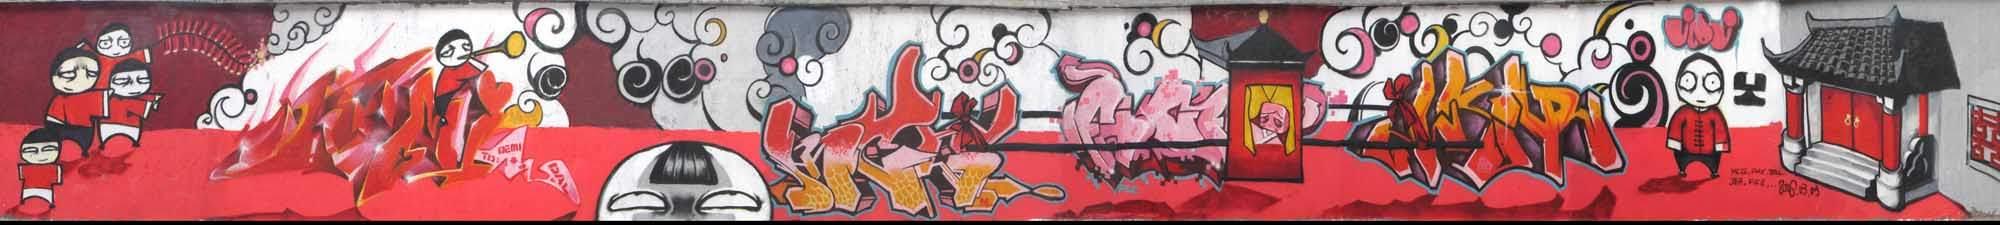 Graffiti: unappreciated art or corrupt vandalism?